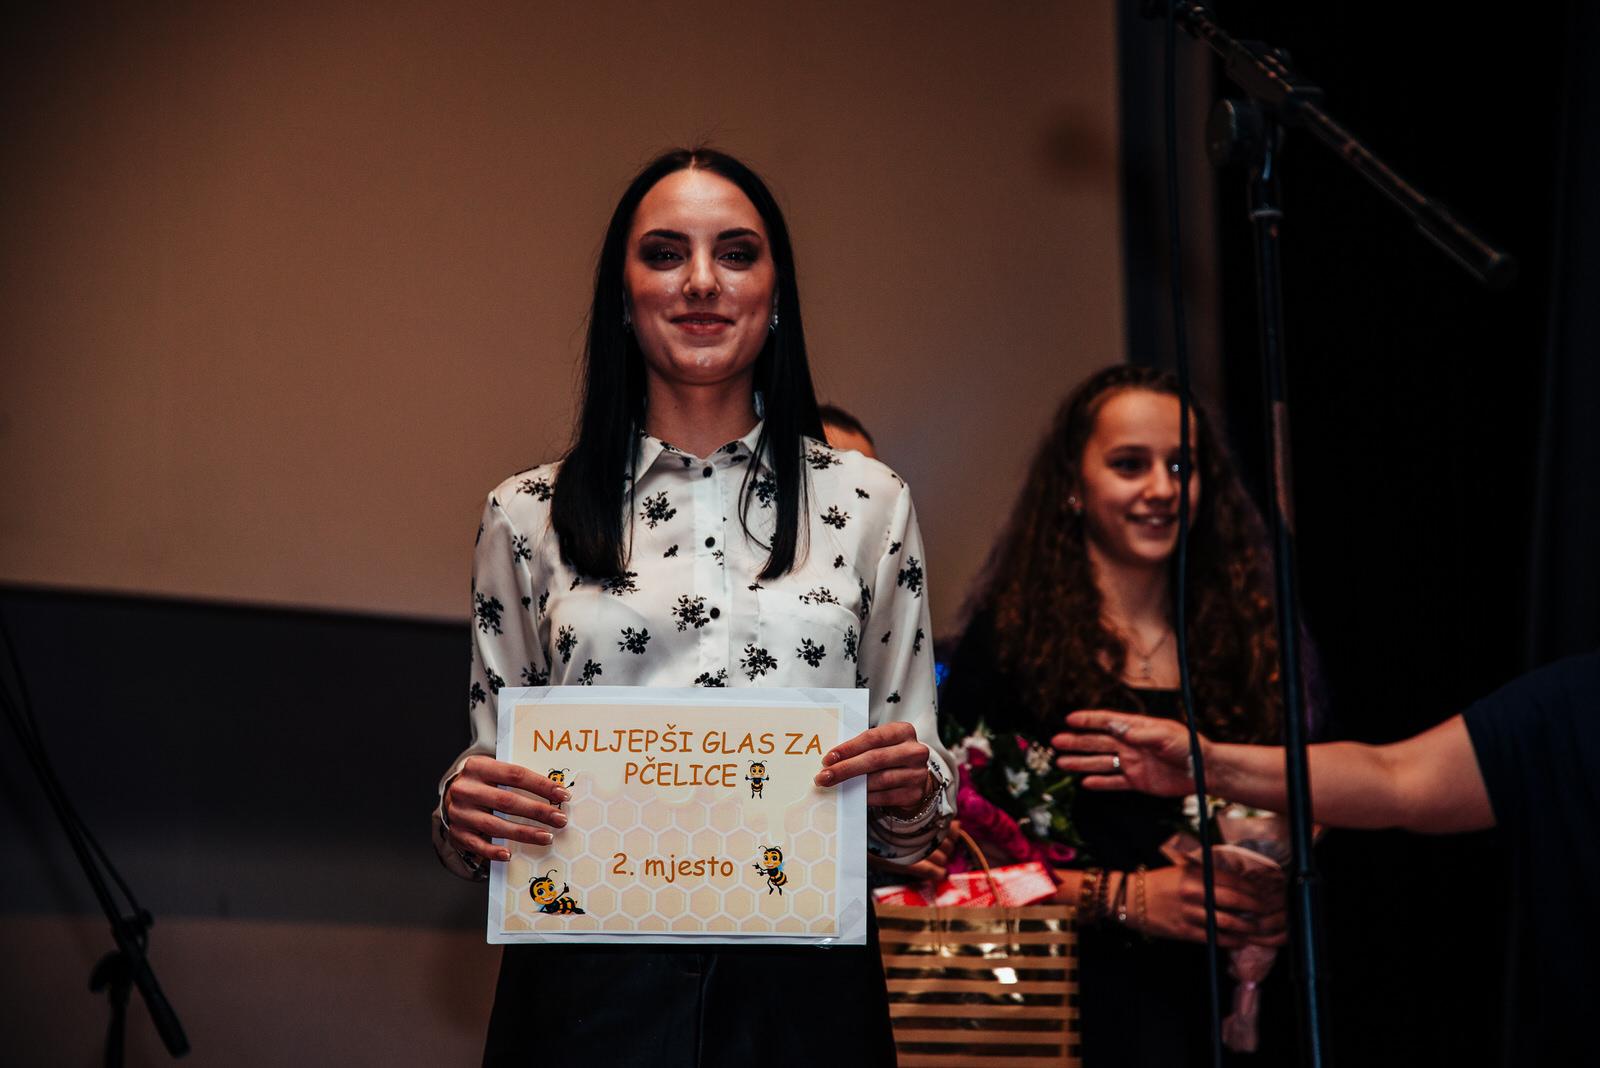 LIKACLUB_Najljepši-glas-za-Pčelice_2019-14